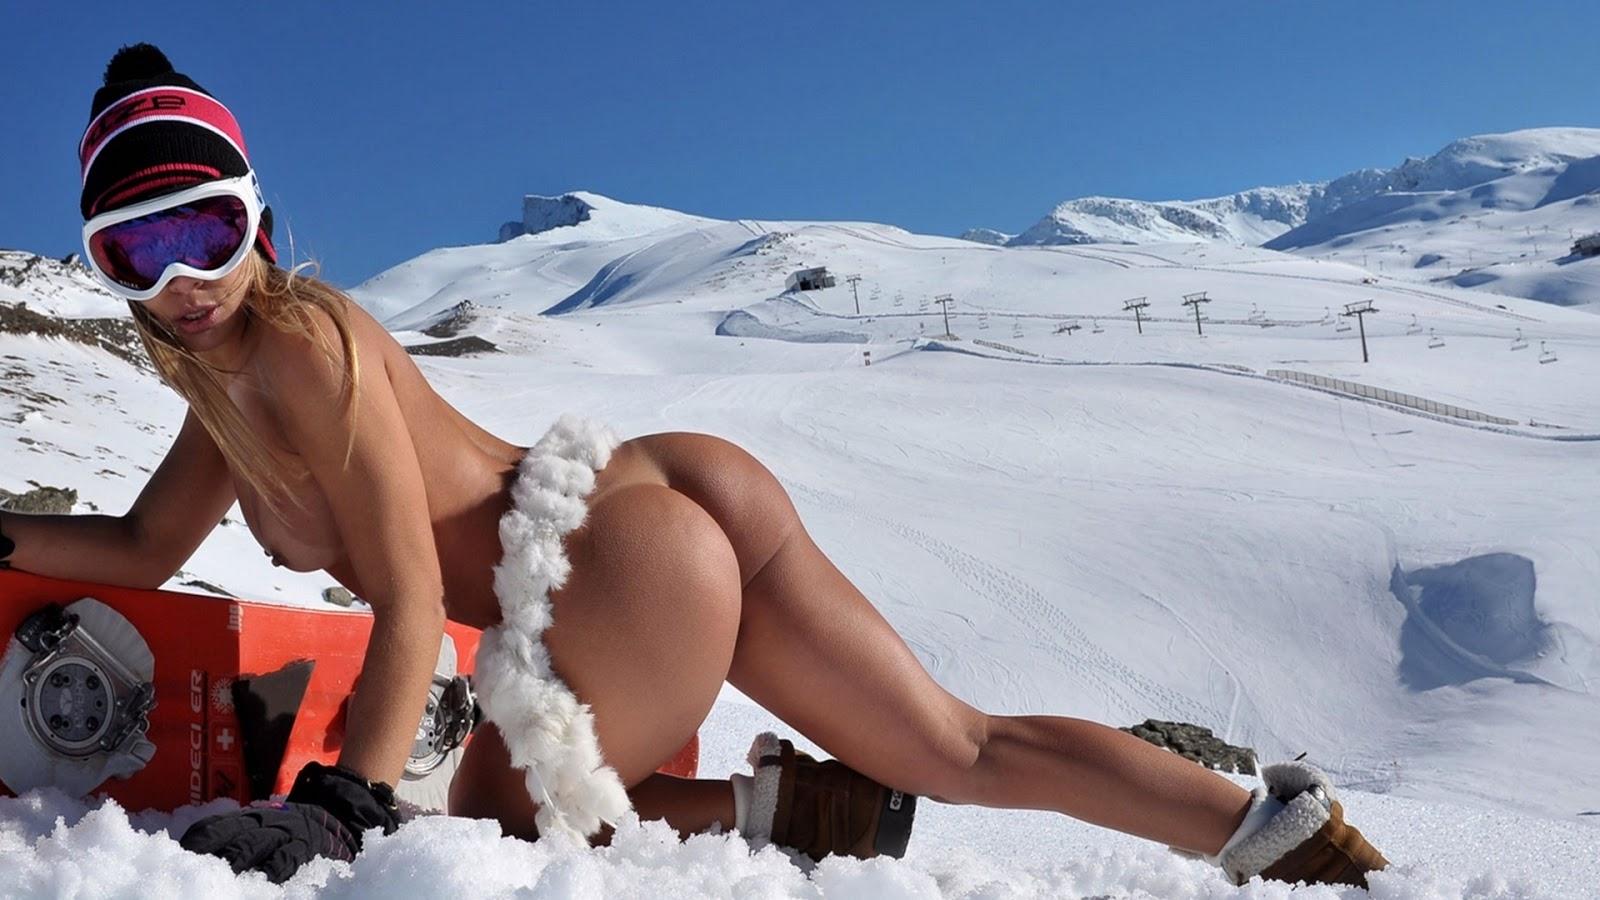 Hot snowboard girls, video porno sorelle olsen nude